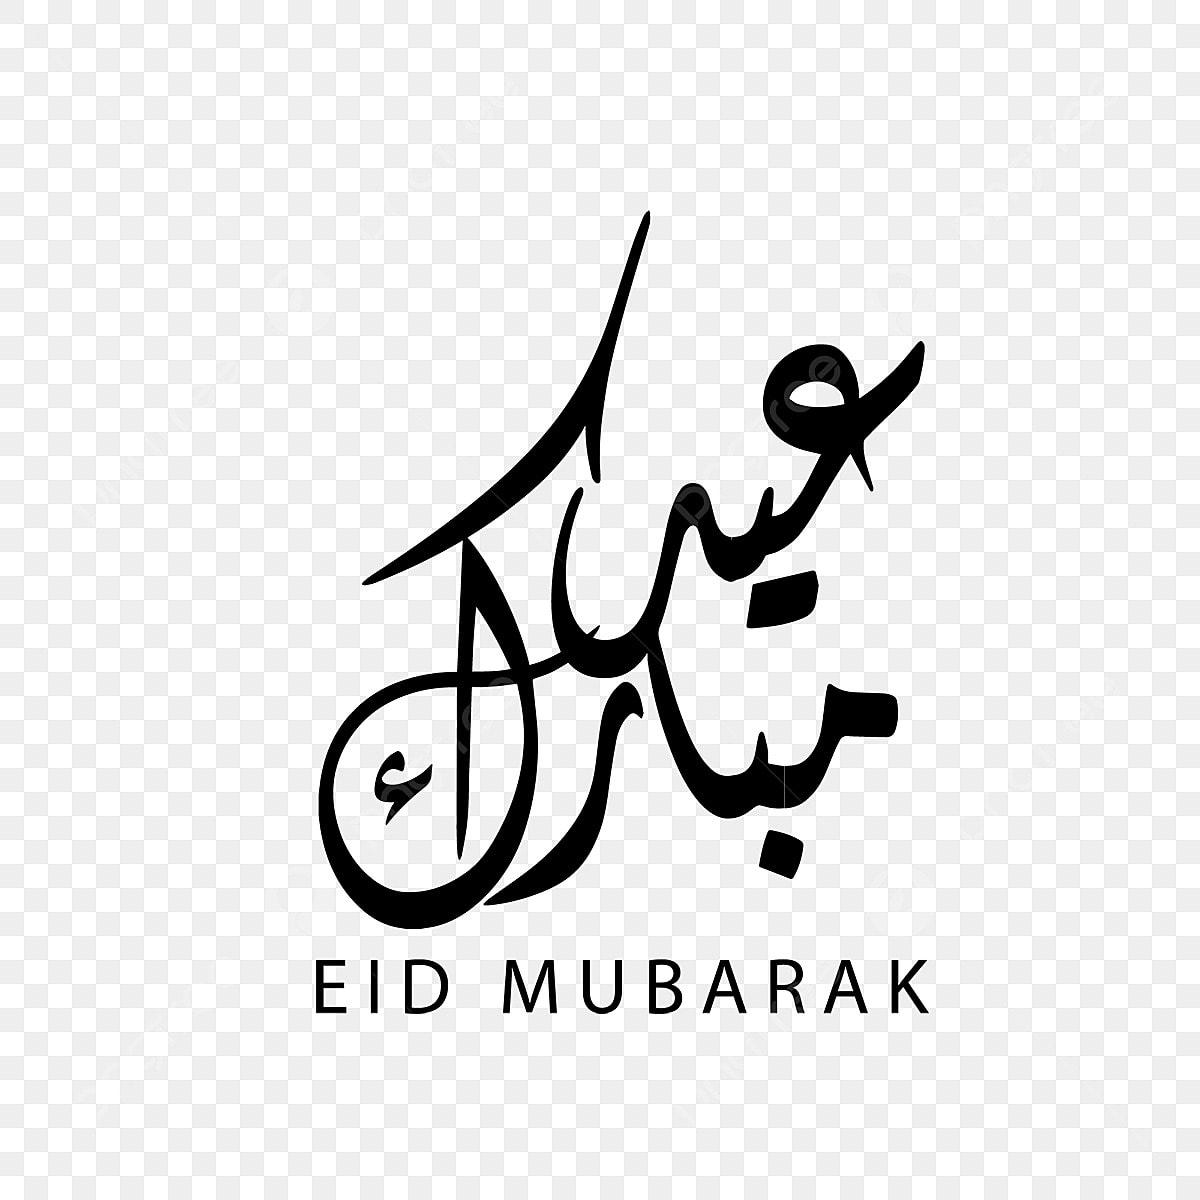 Eid Mubarak Diwani Calliigraphy Png Free Download Eid Eid